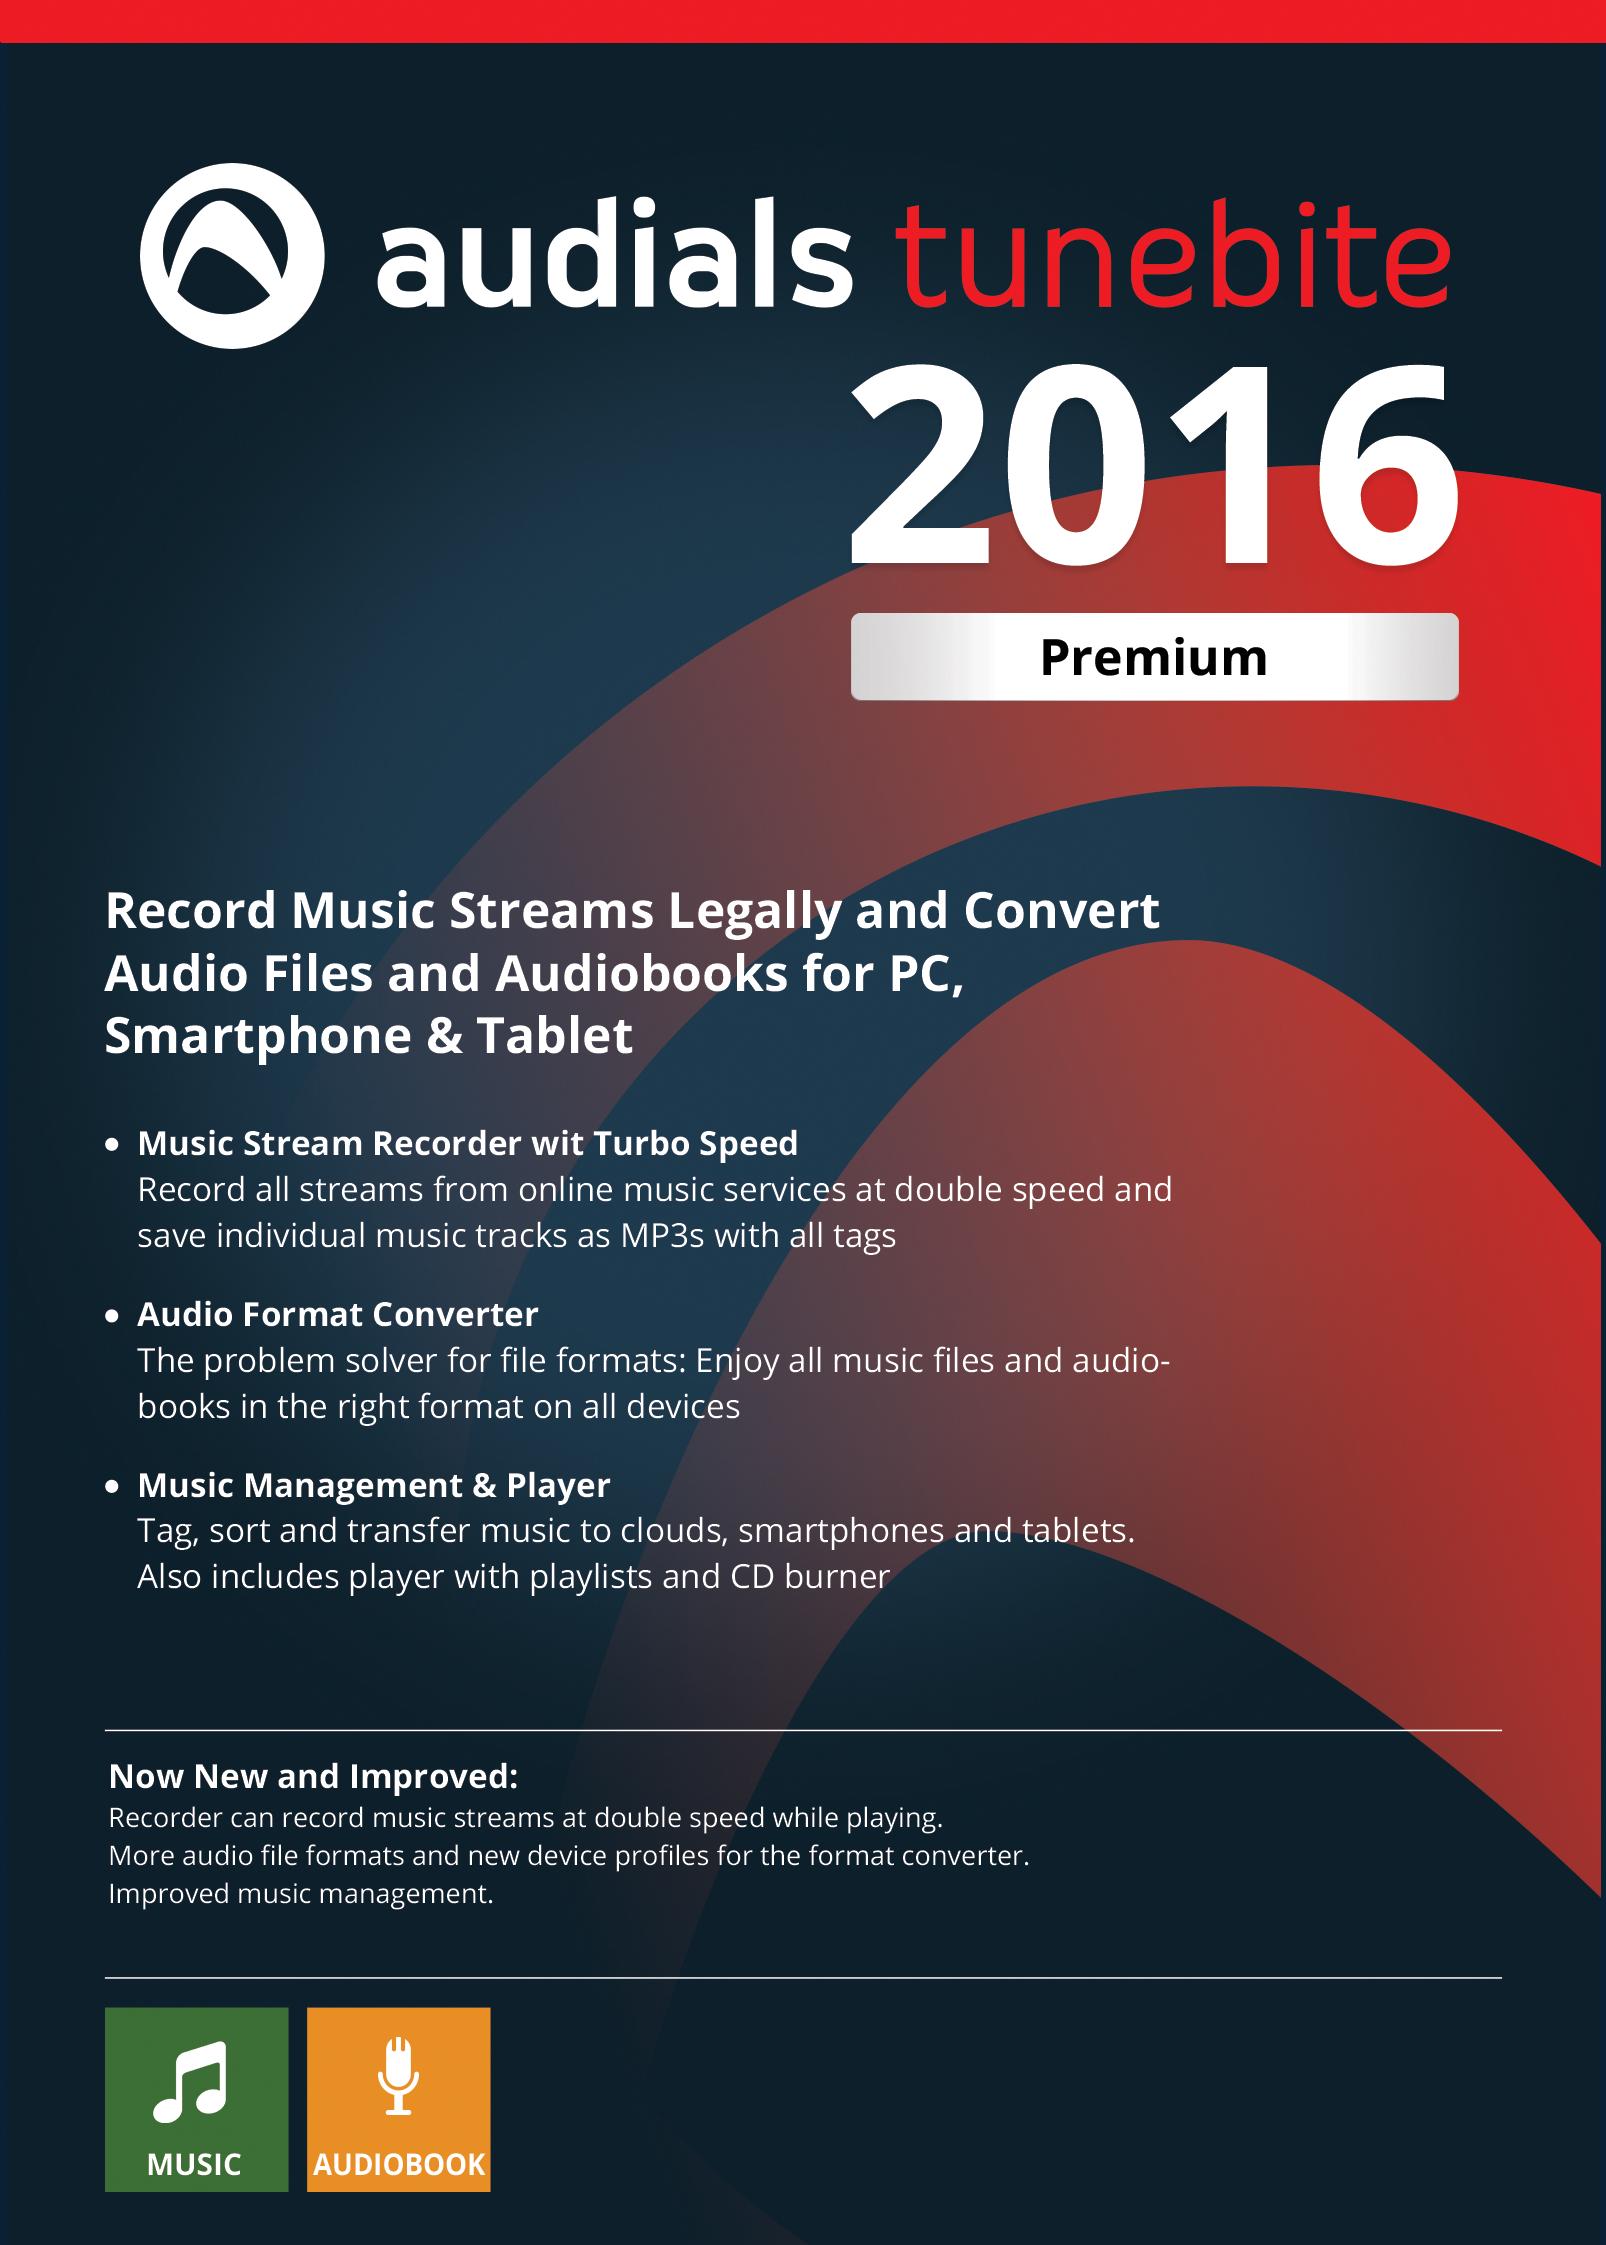 audials-tunebite-2016-premium-low-price-recorder-for-recording-music-streams-with-audio-format-conve